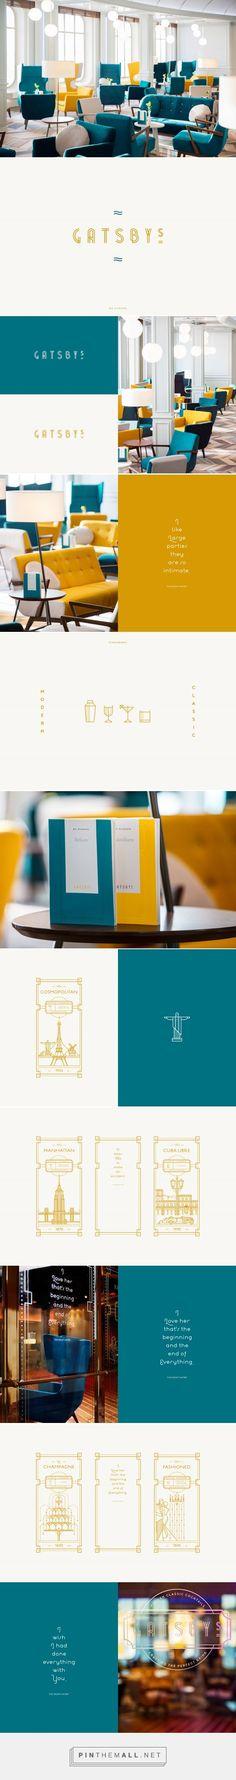 GATSBY°S Restaurant Branding by Studio Chapeaux